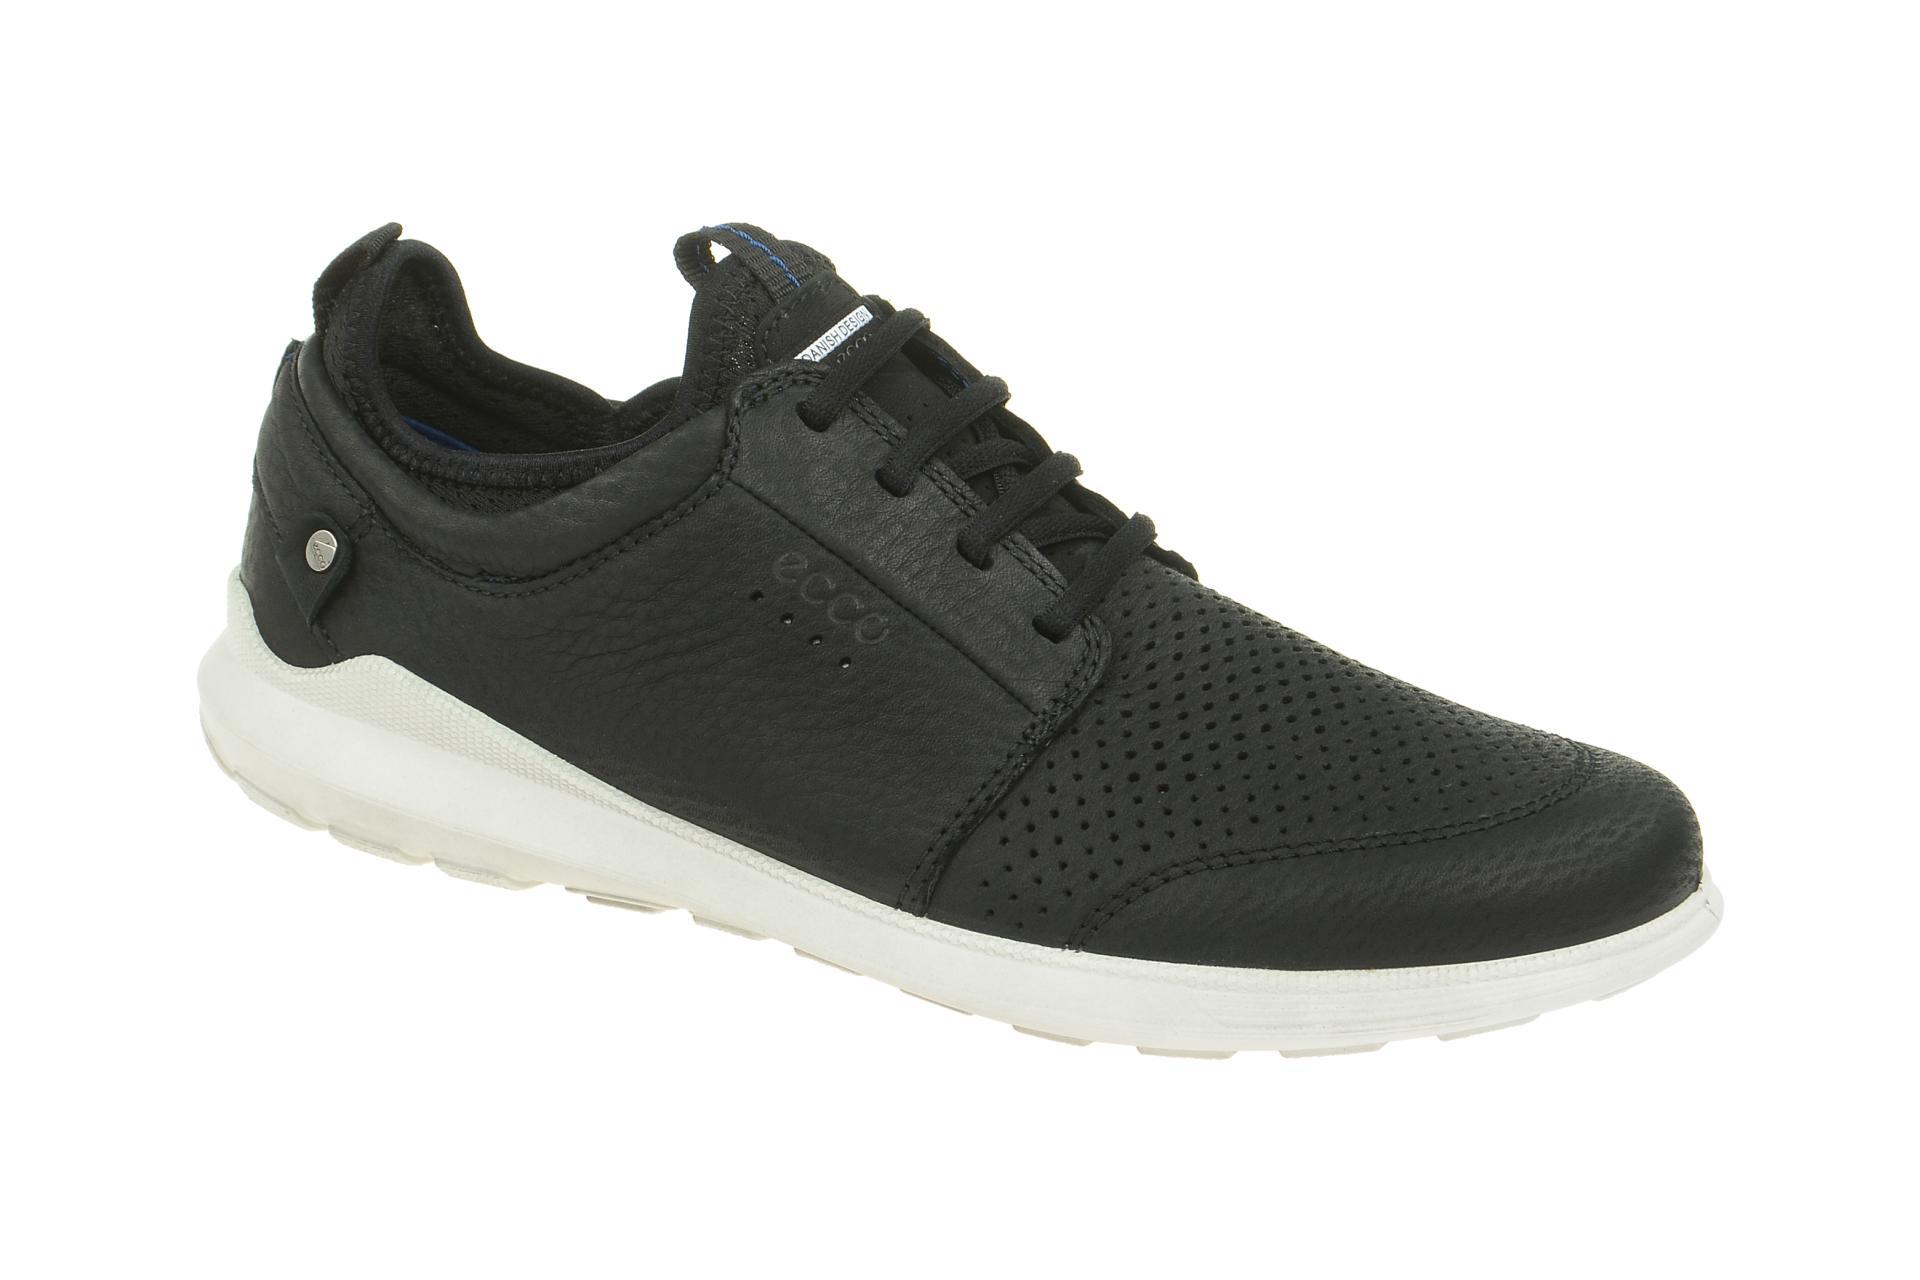 9abf7f043bcdf2 Ecco Schuhe TRANSIT schwarz Herrenschuhe Sneakers 53480402001 NEU